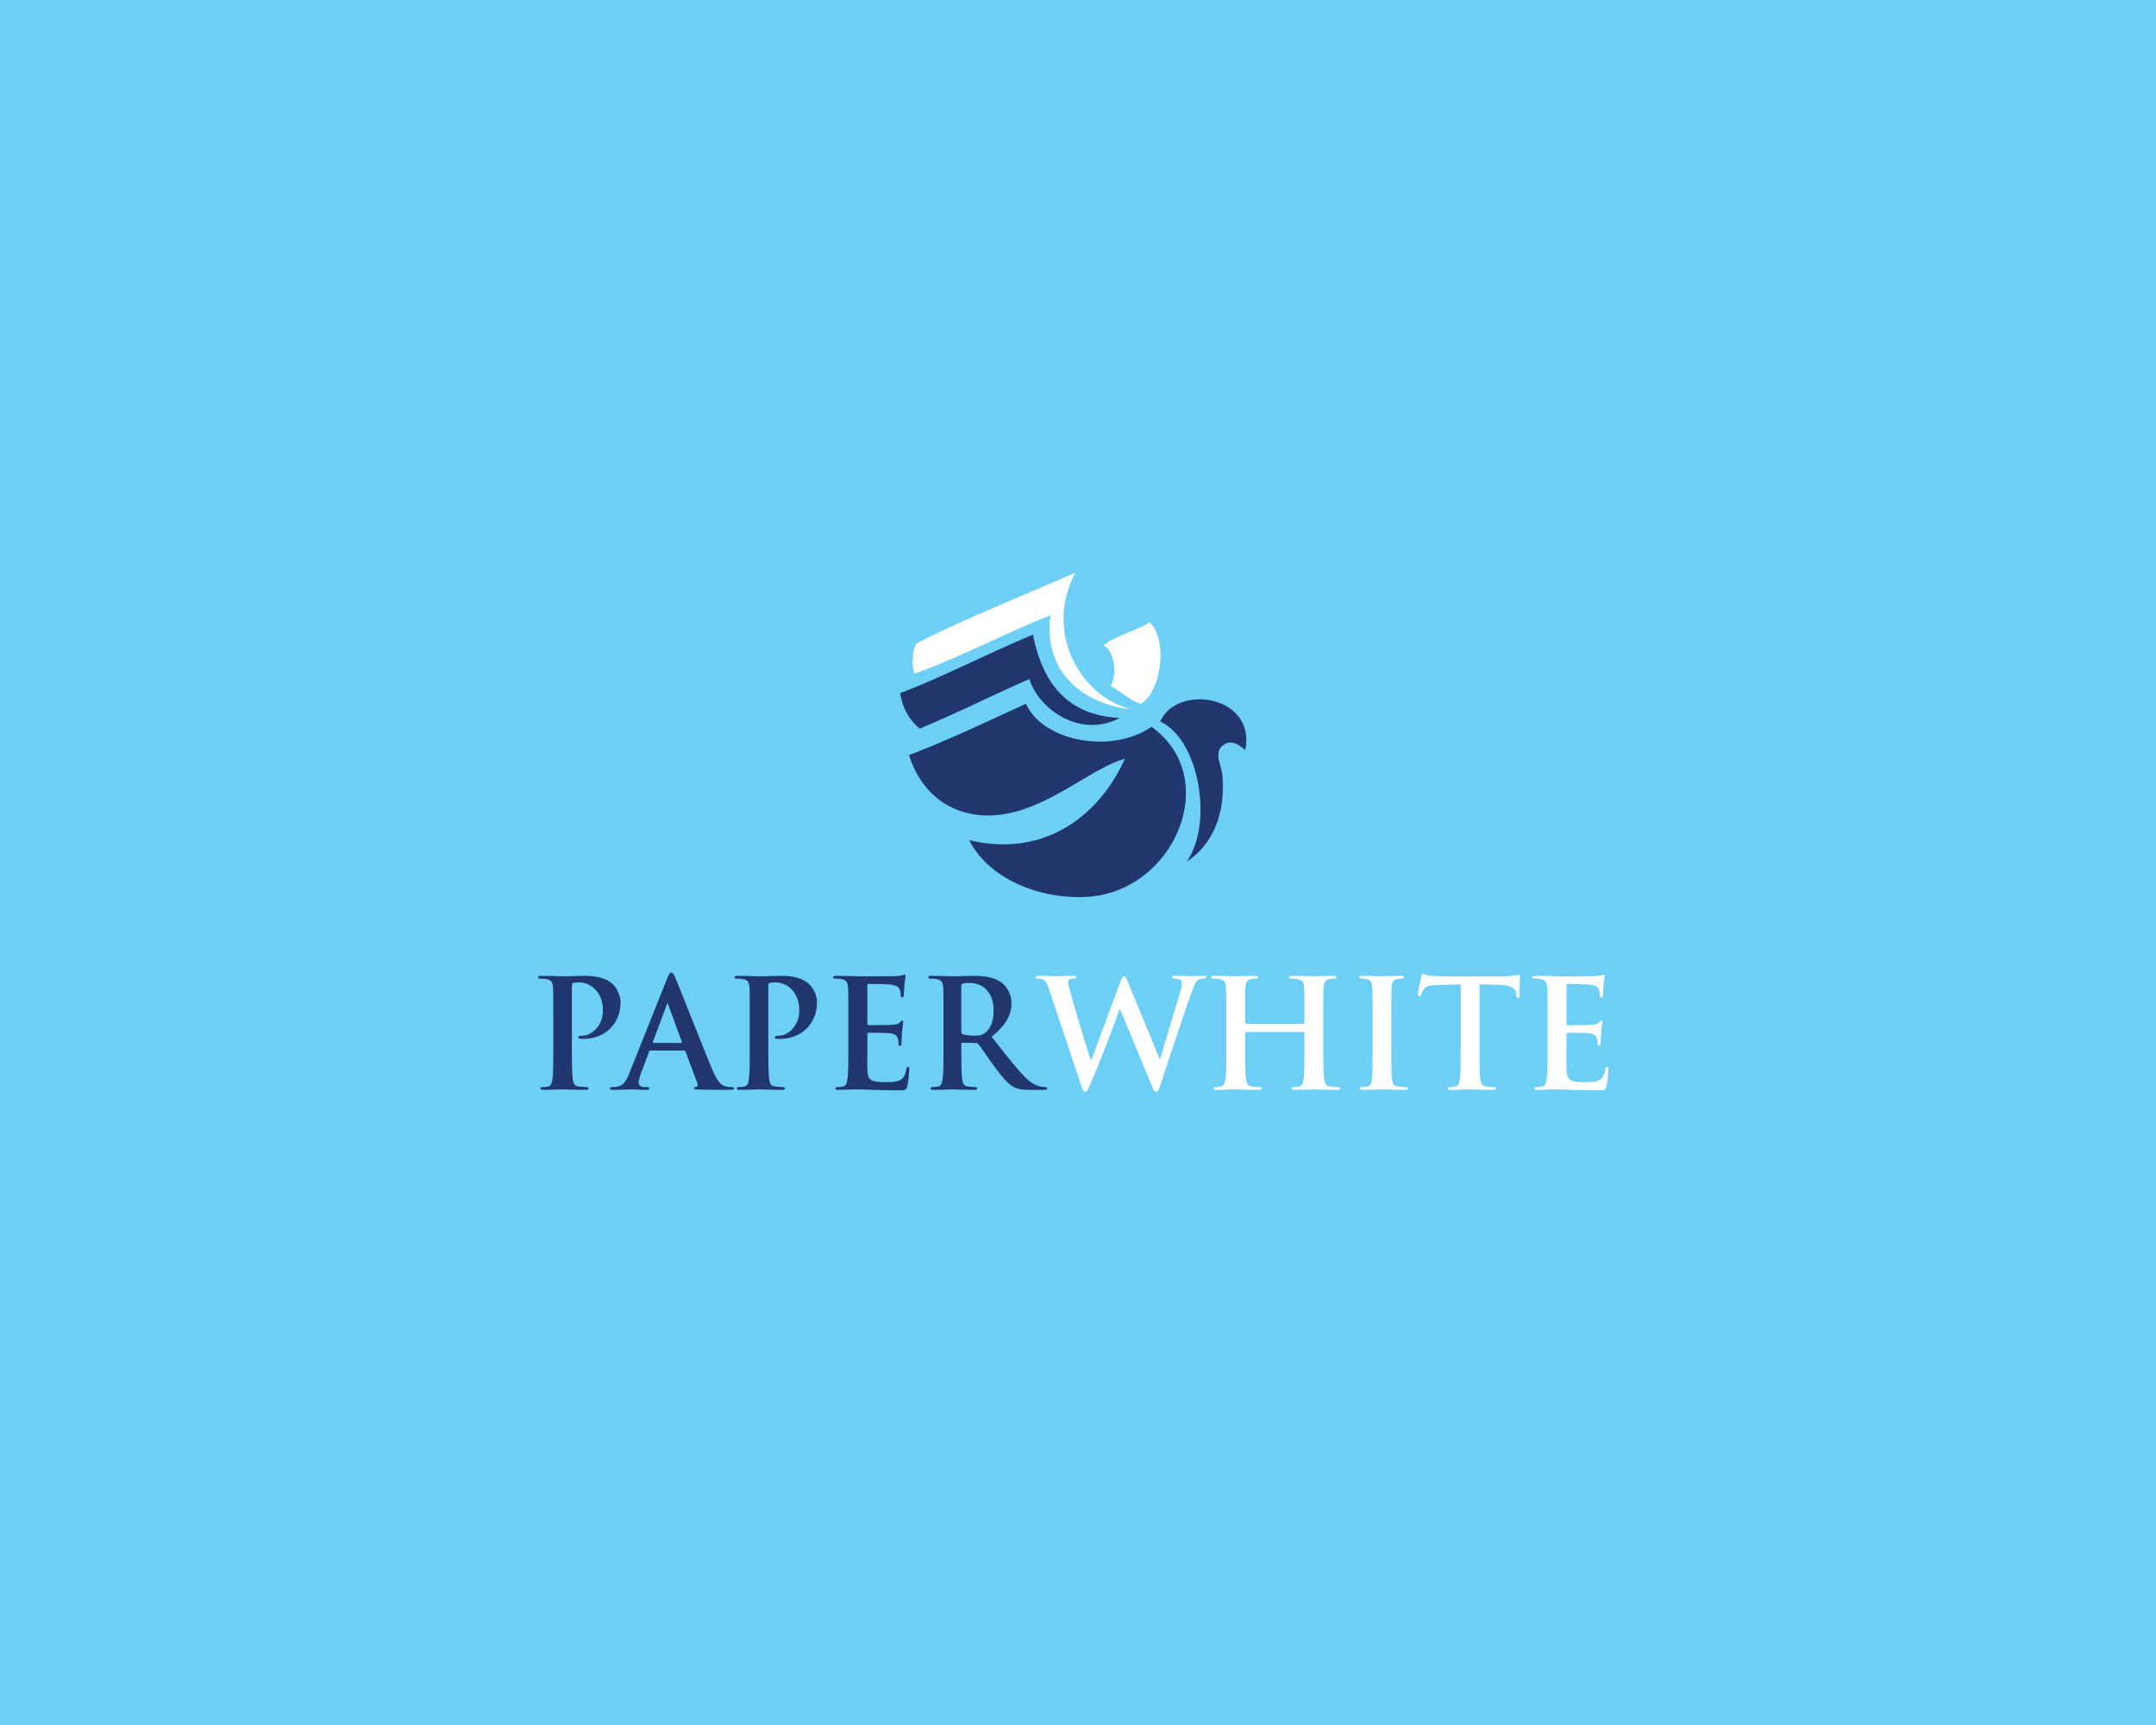 Paperwhite Logo